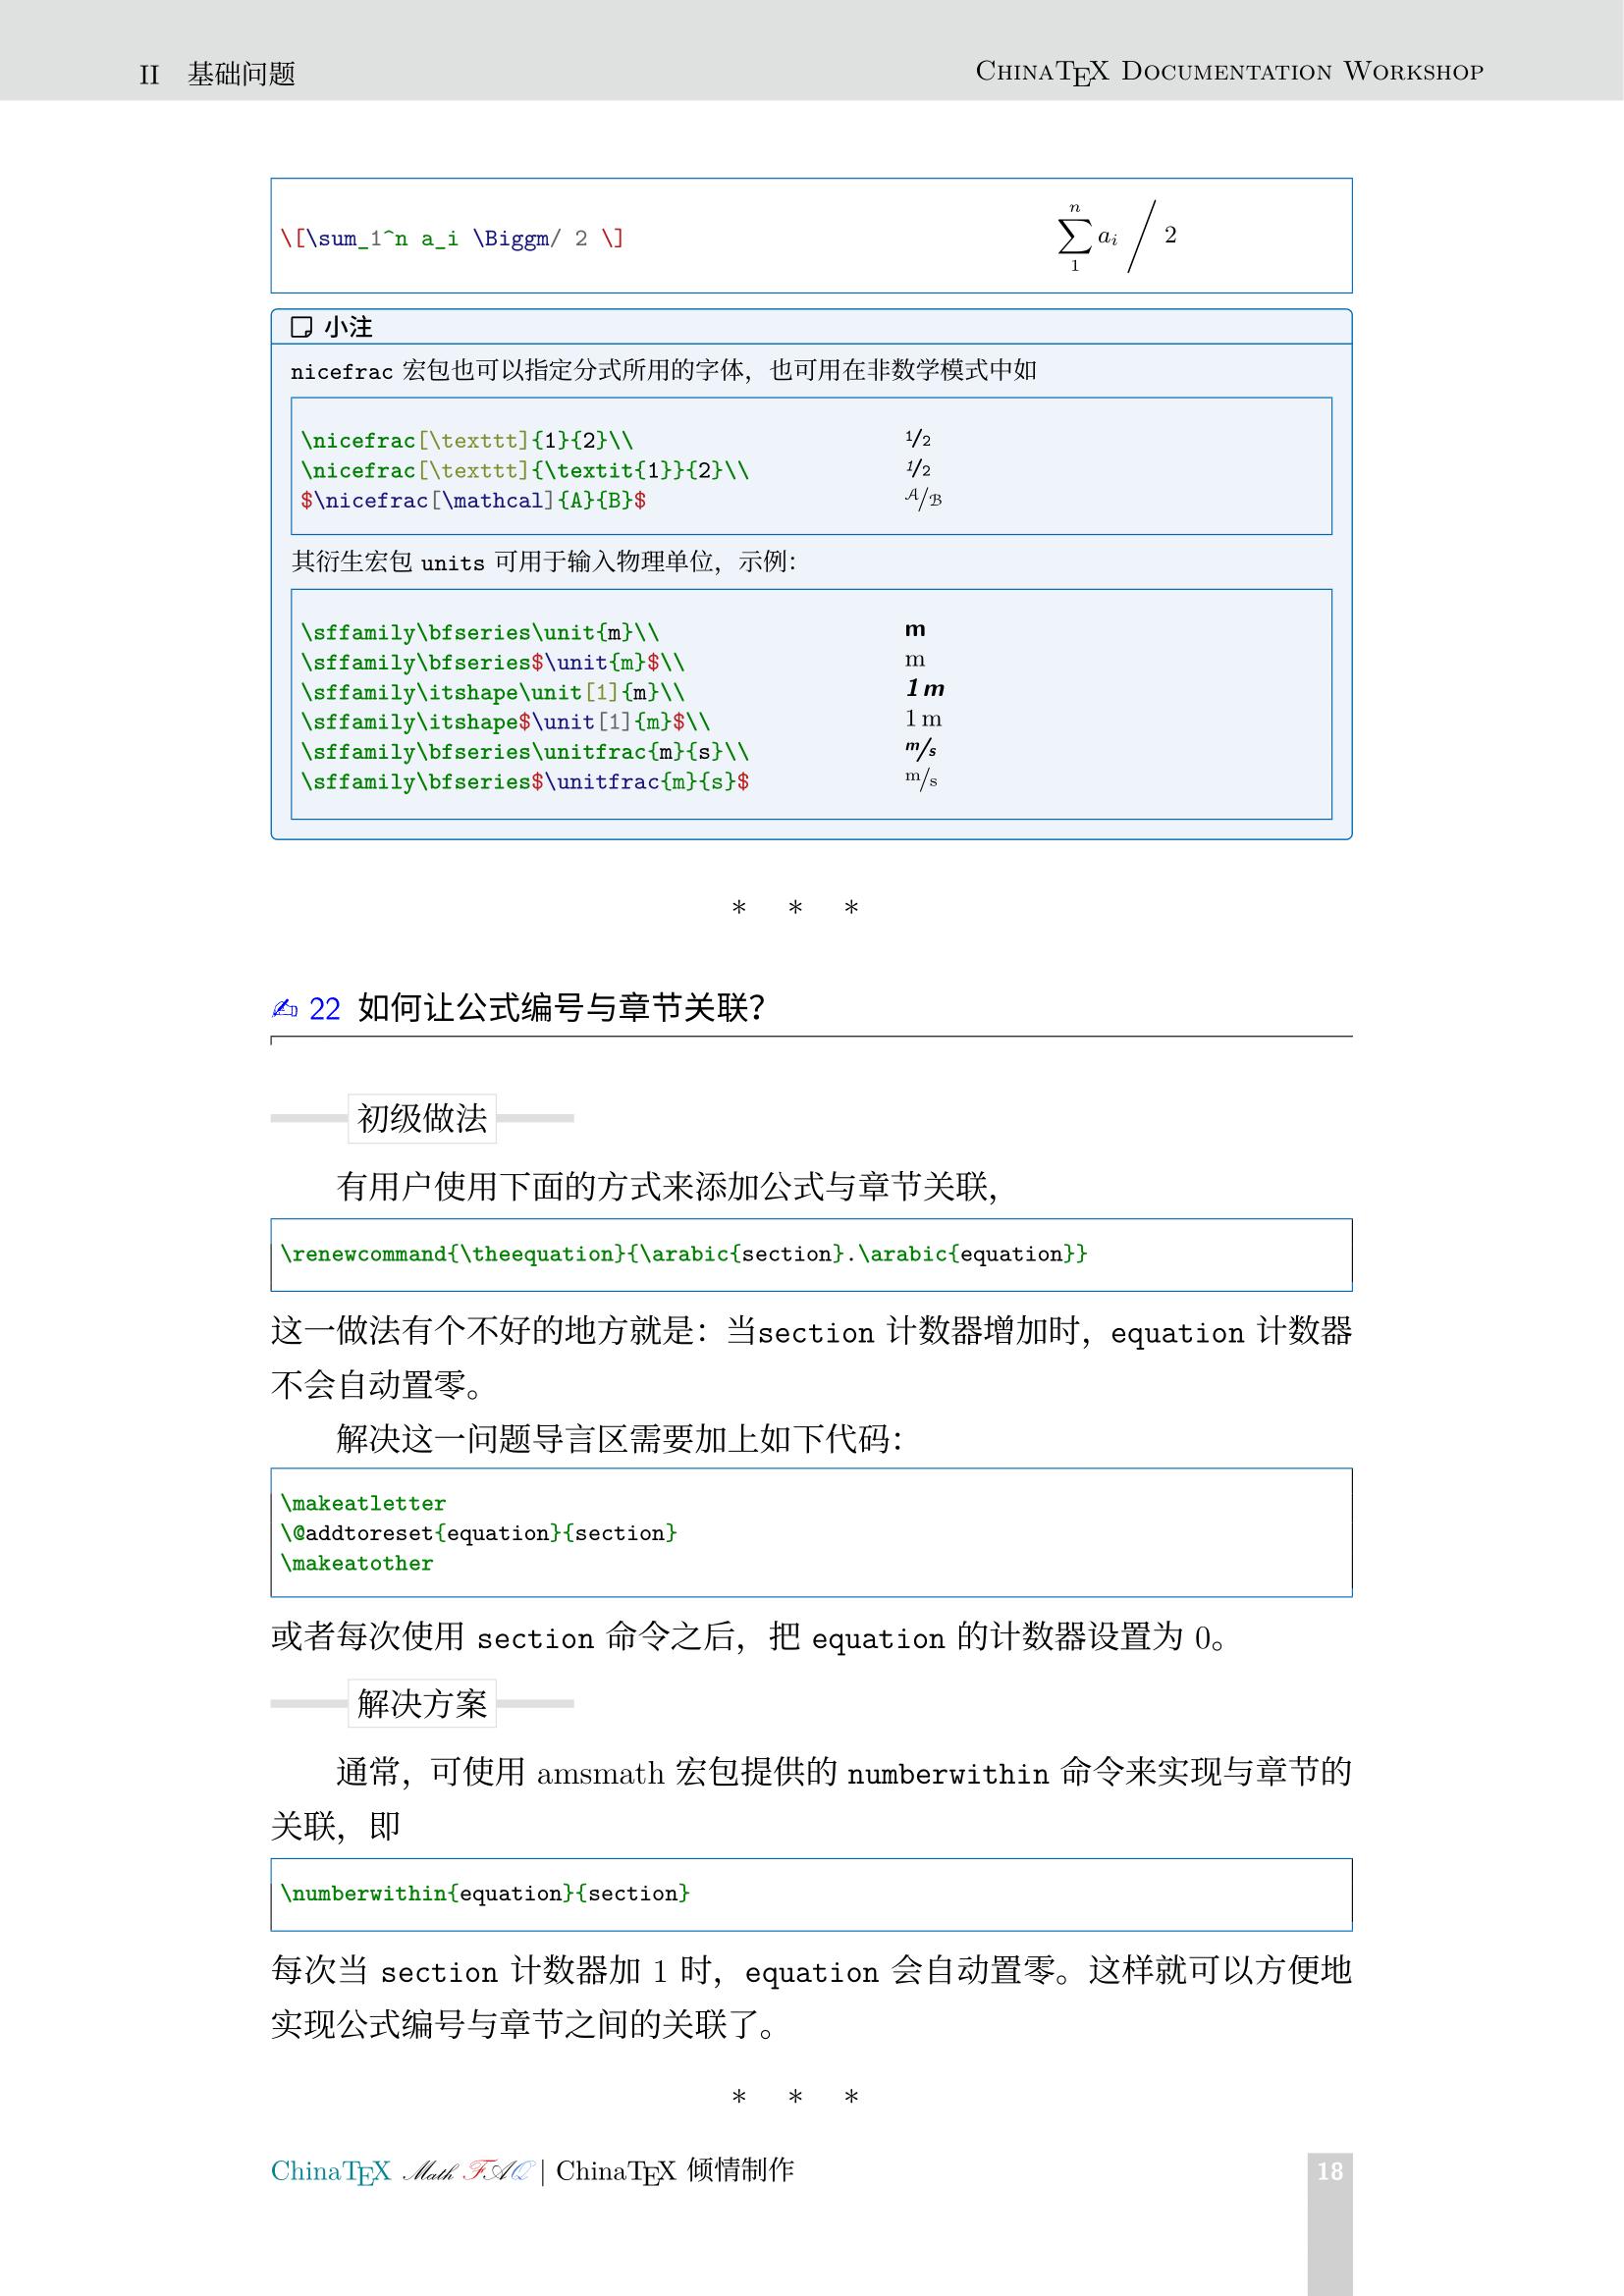 ChinaTeX 数学排版常见问题集 1.3 发布 - 含源码